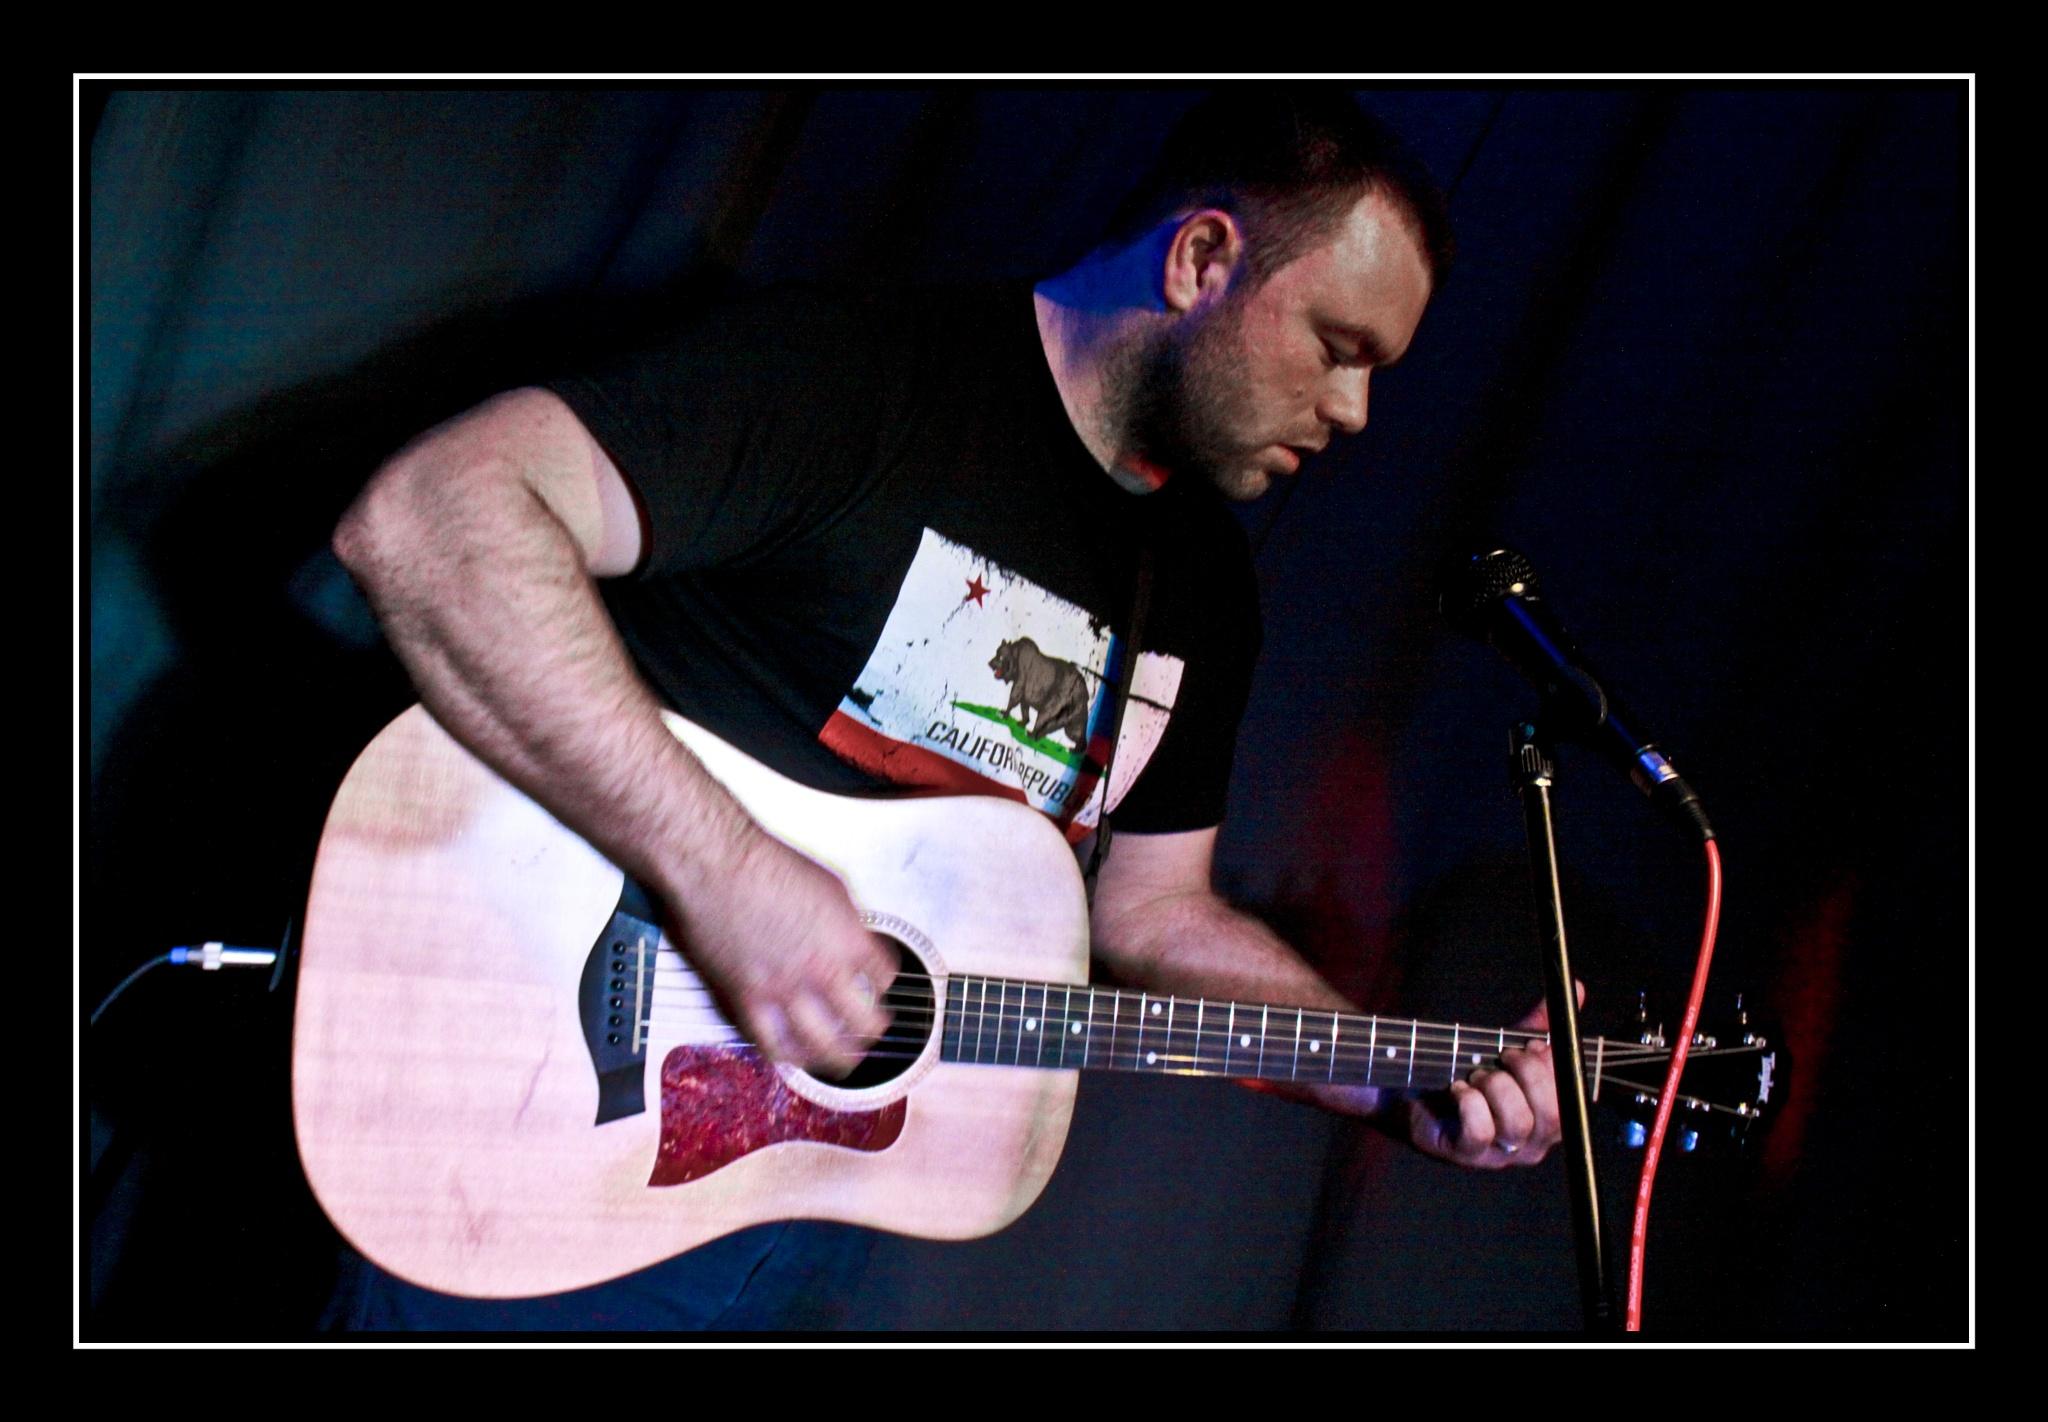 Ashley Evans - UK Musician by mel.harrison.5439